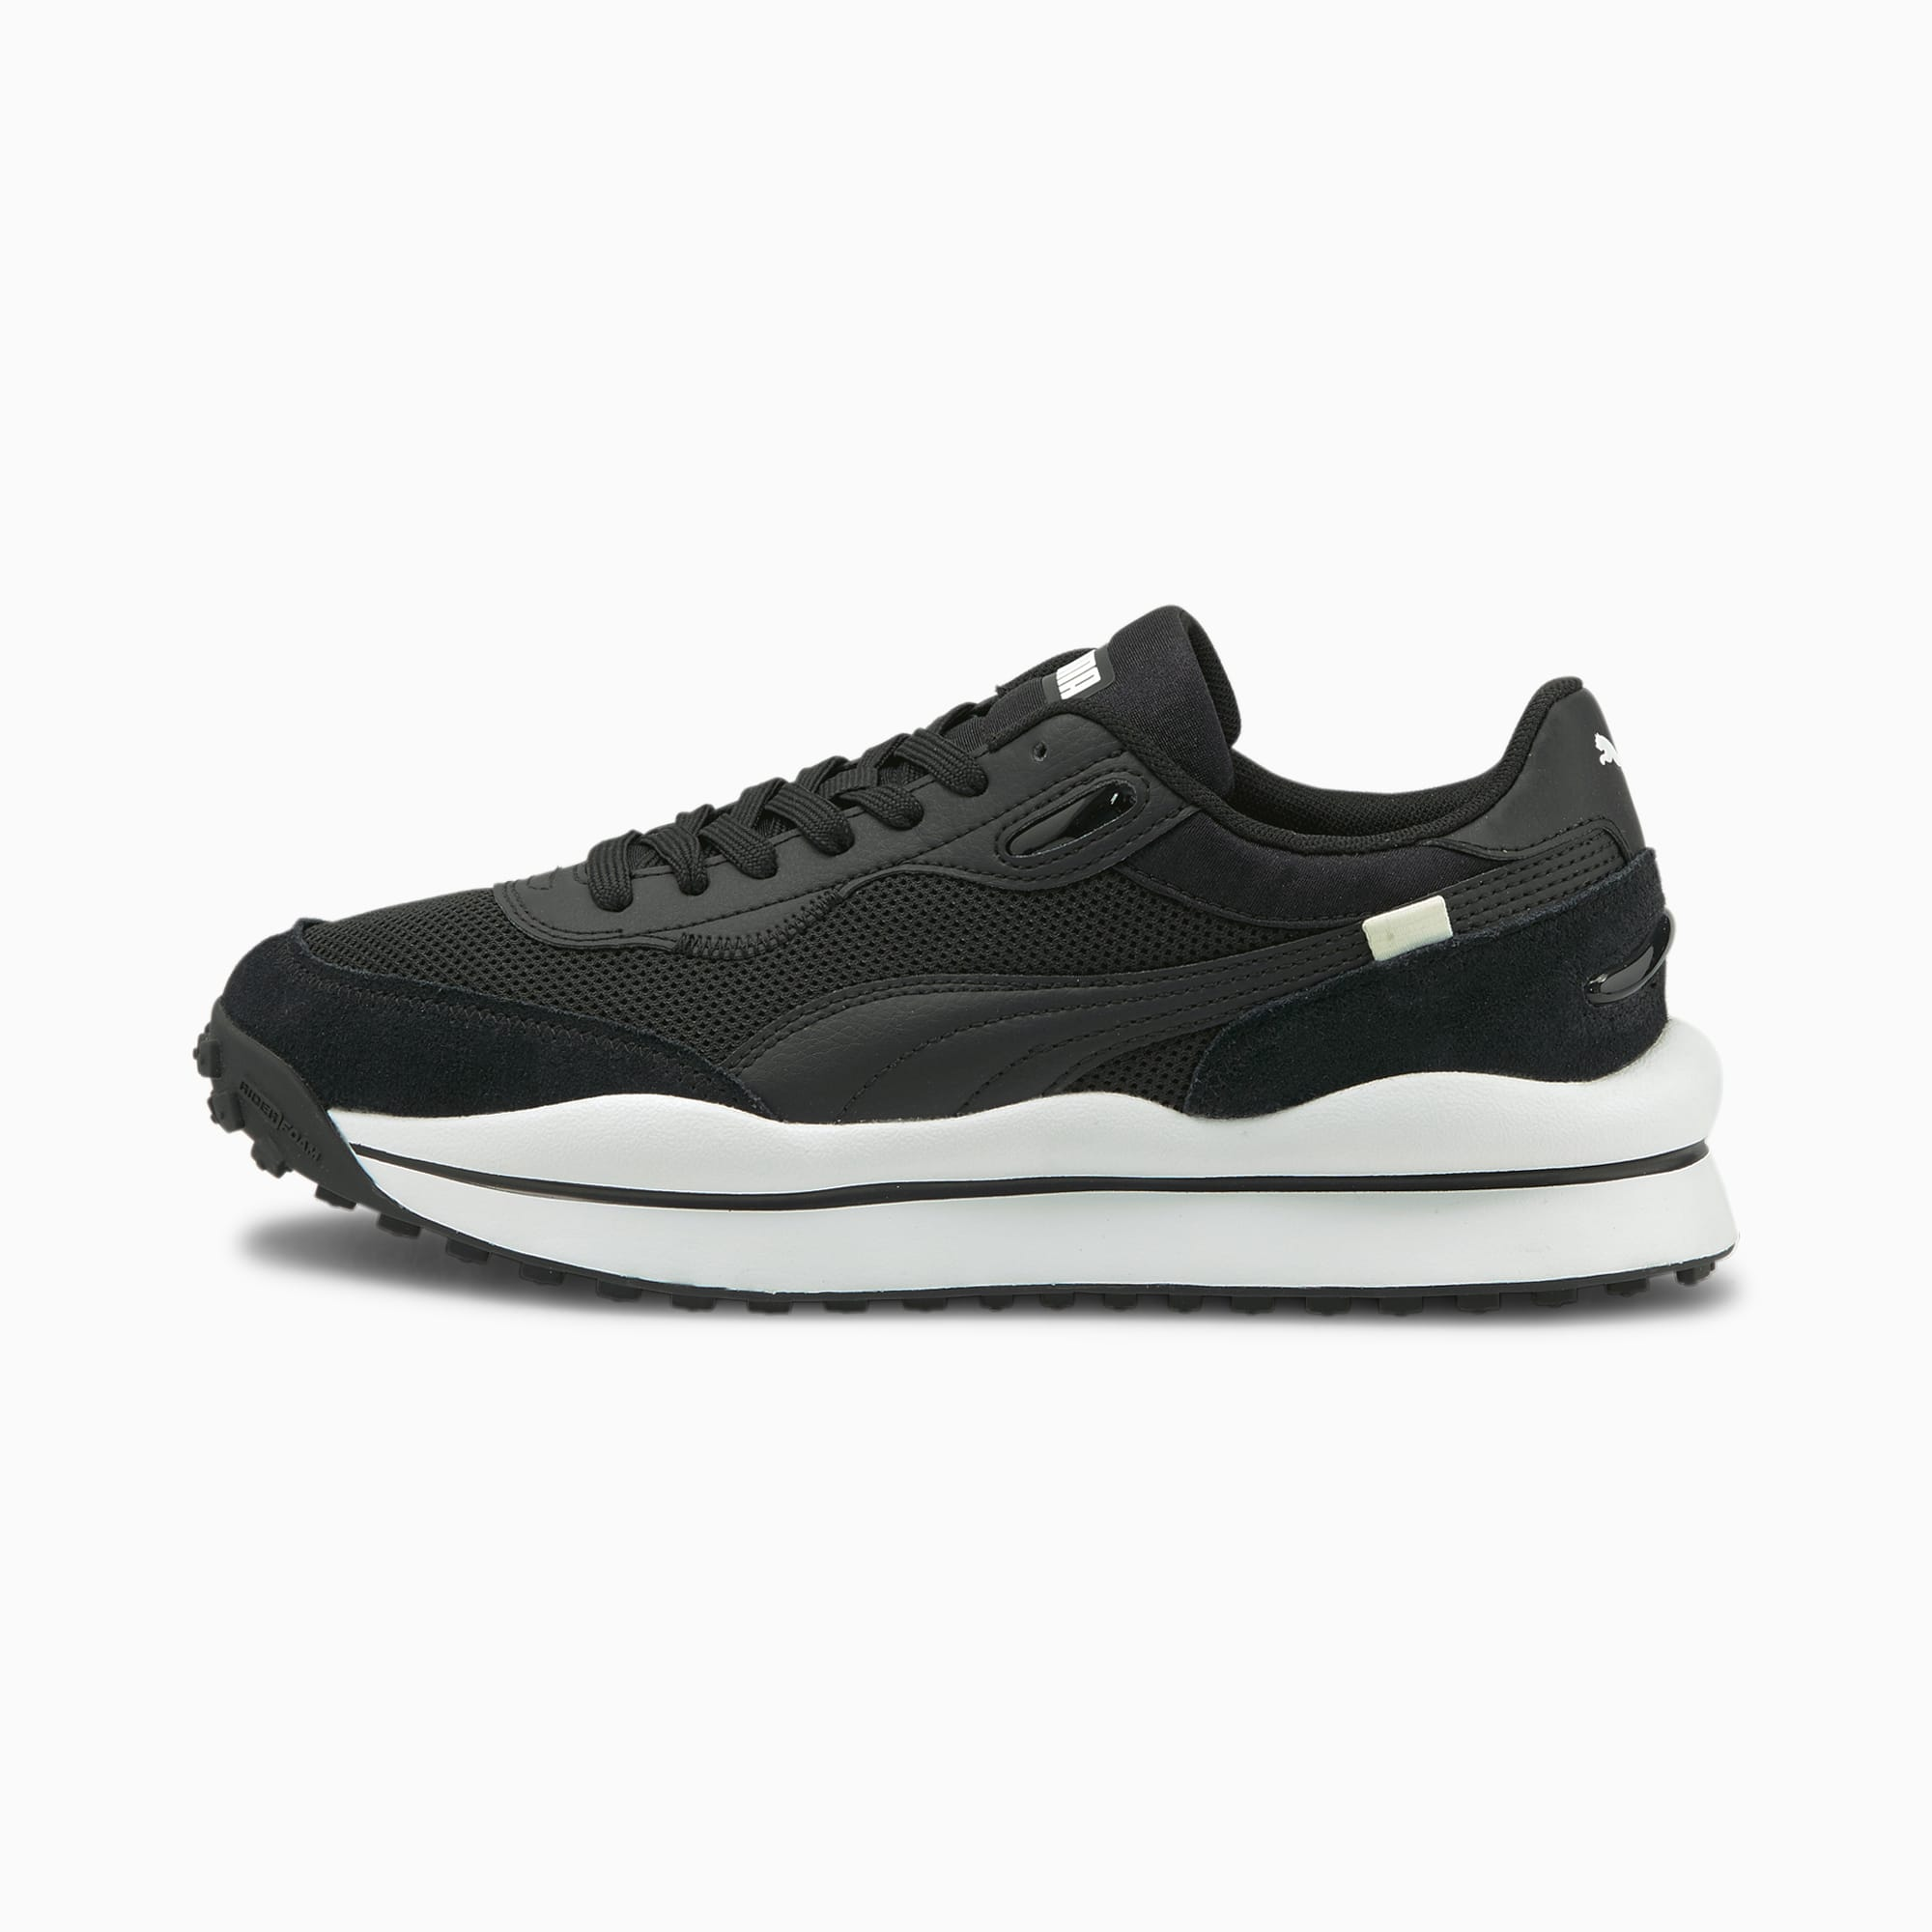 Style Rider Clean sneakers, Wit/Zwart, Maat 35,5 | PUMA